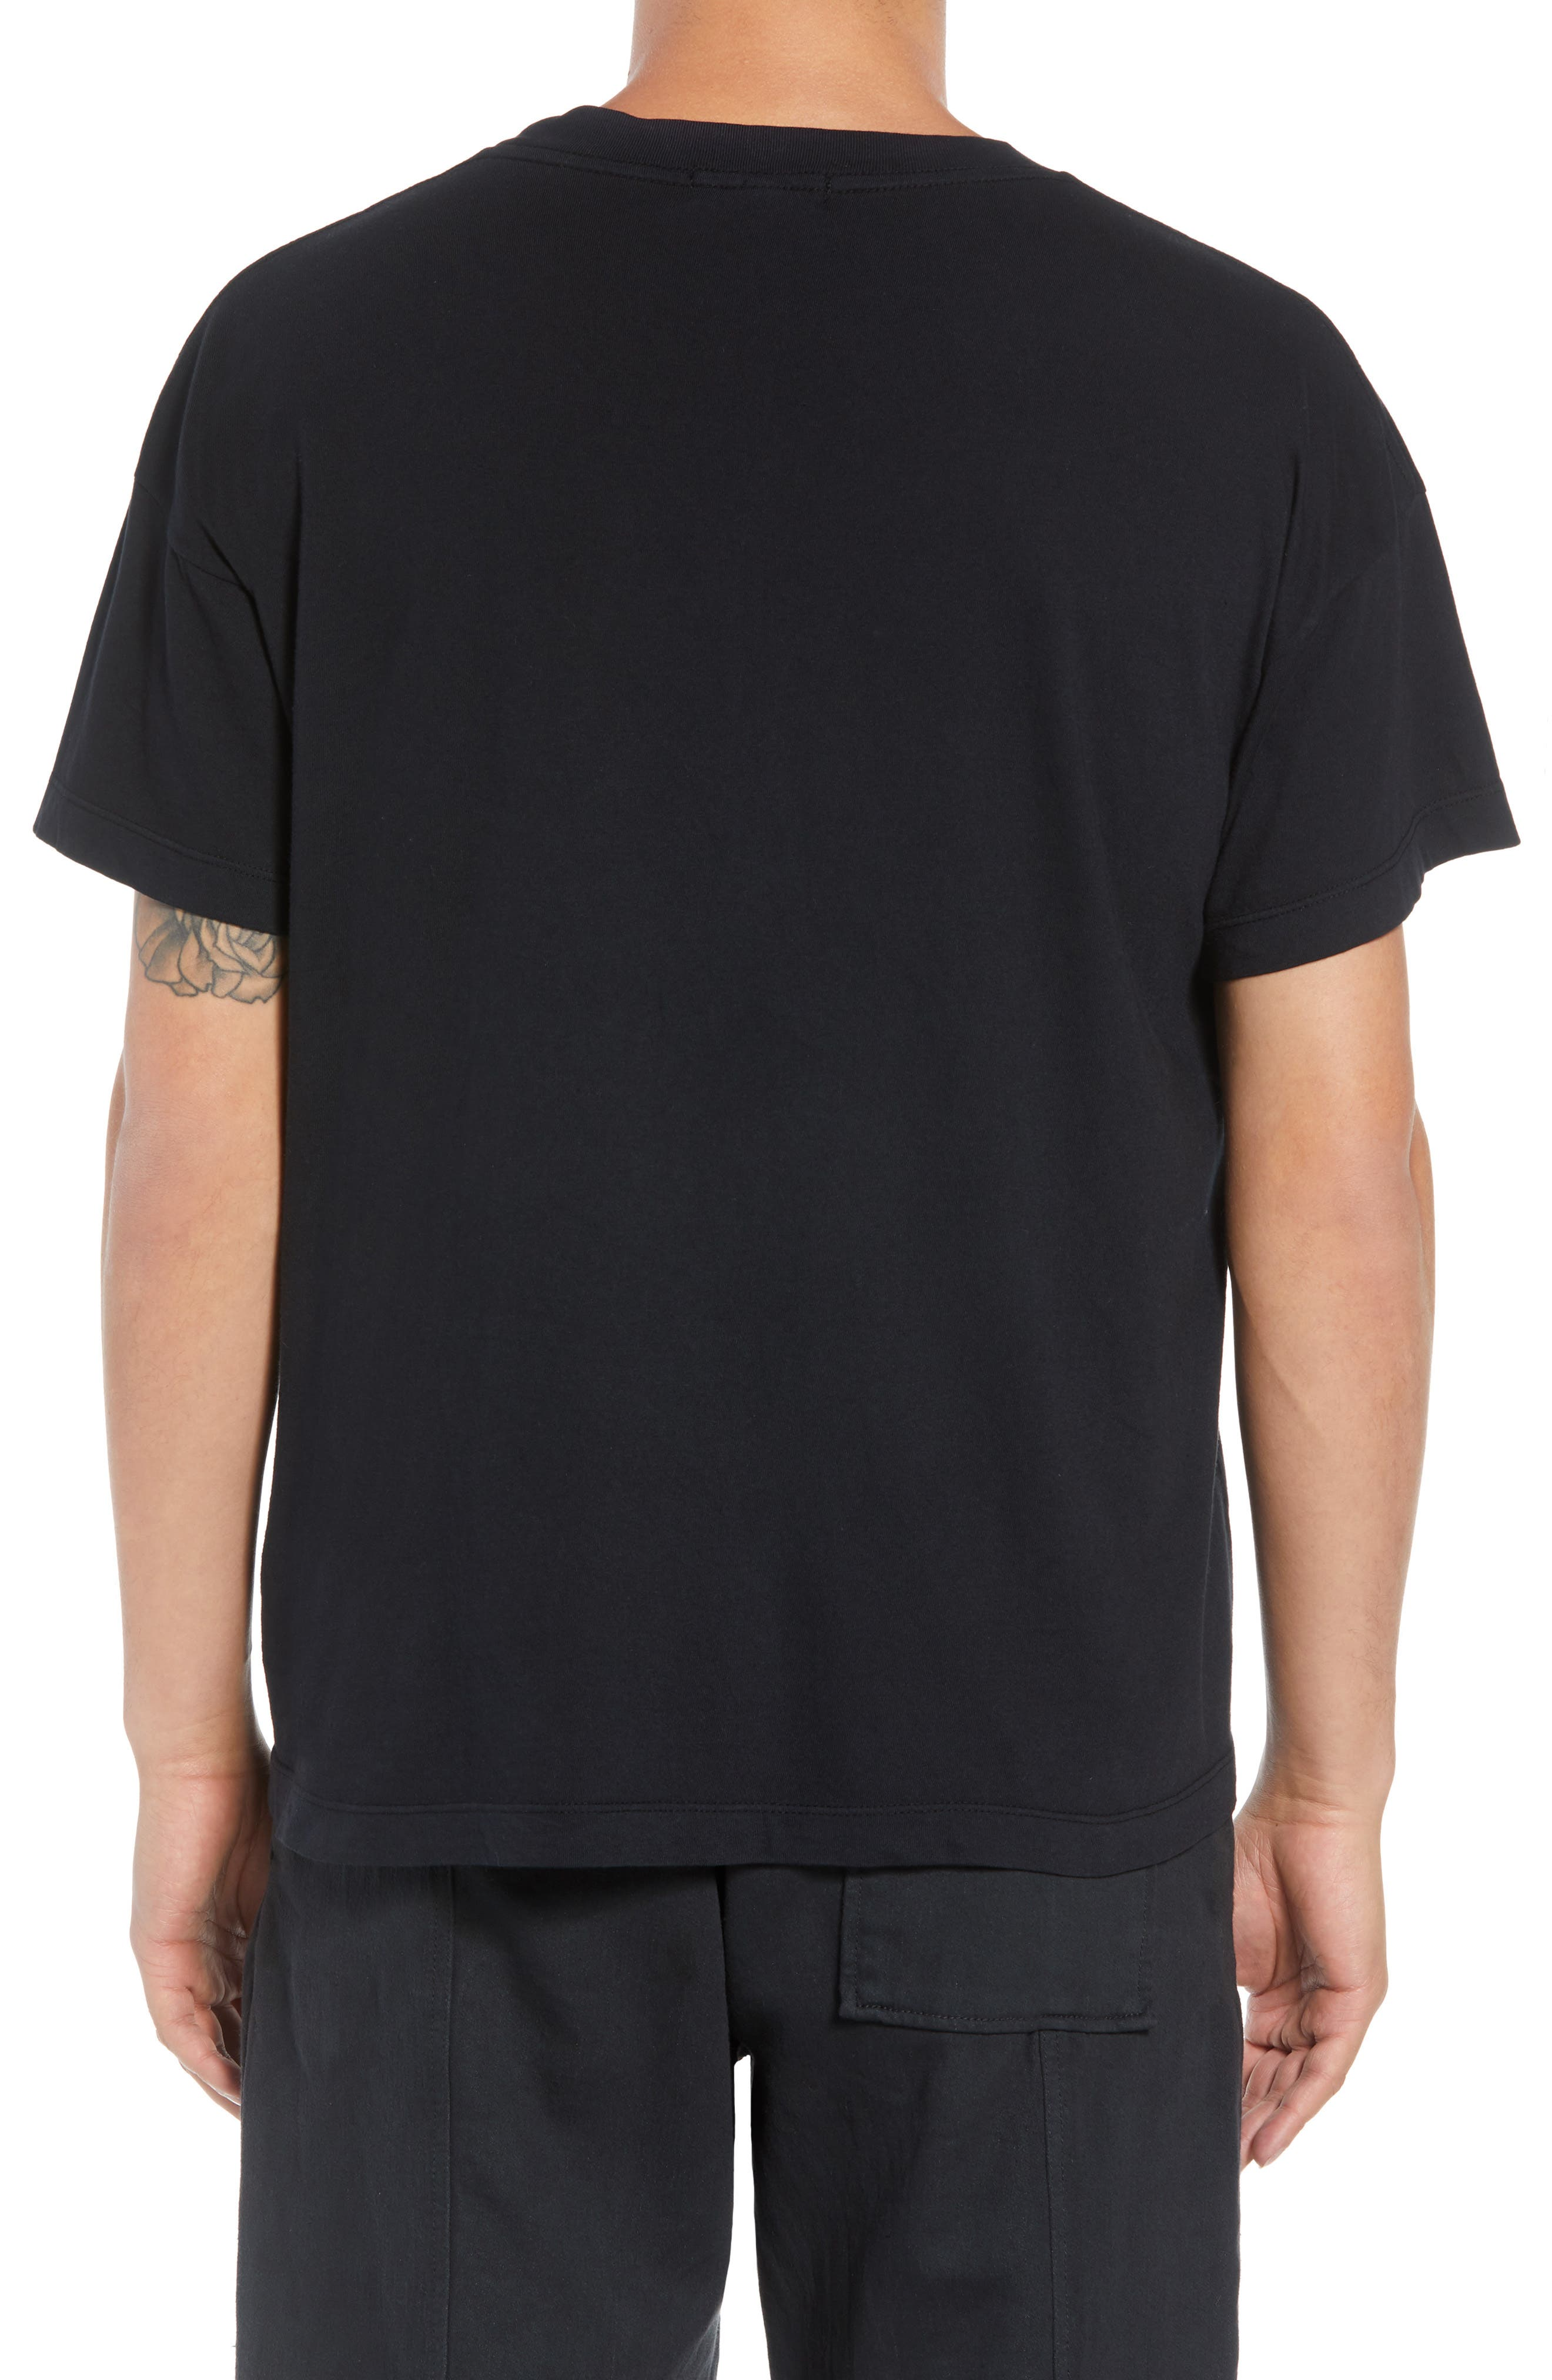 Hayes T-Shirt,                             Alternate thumbnail 2, color,                             001